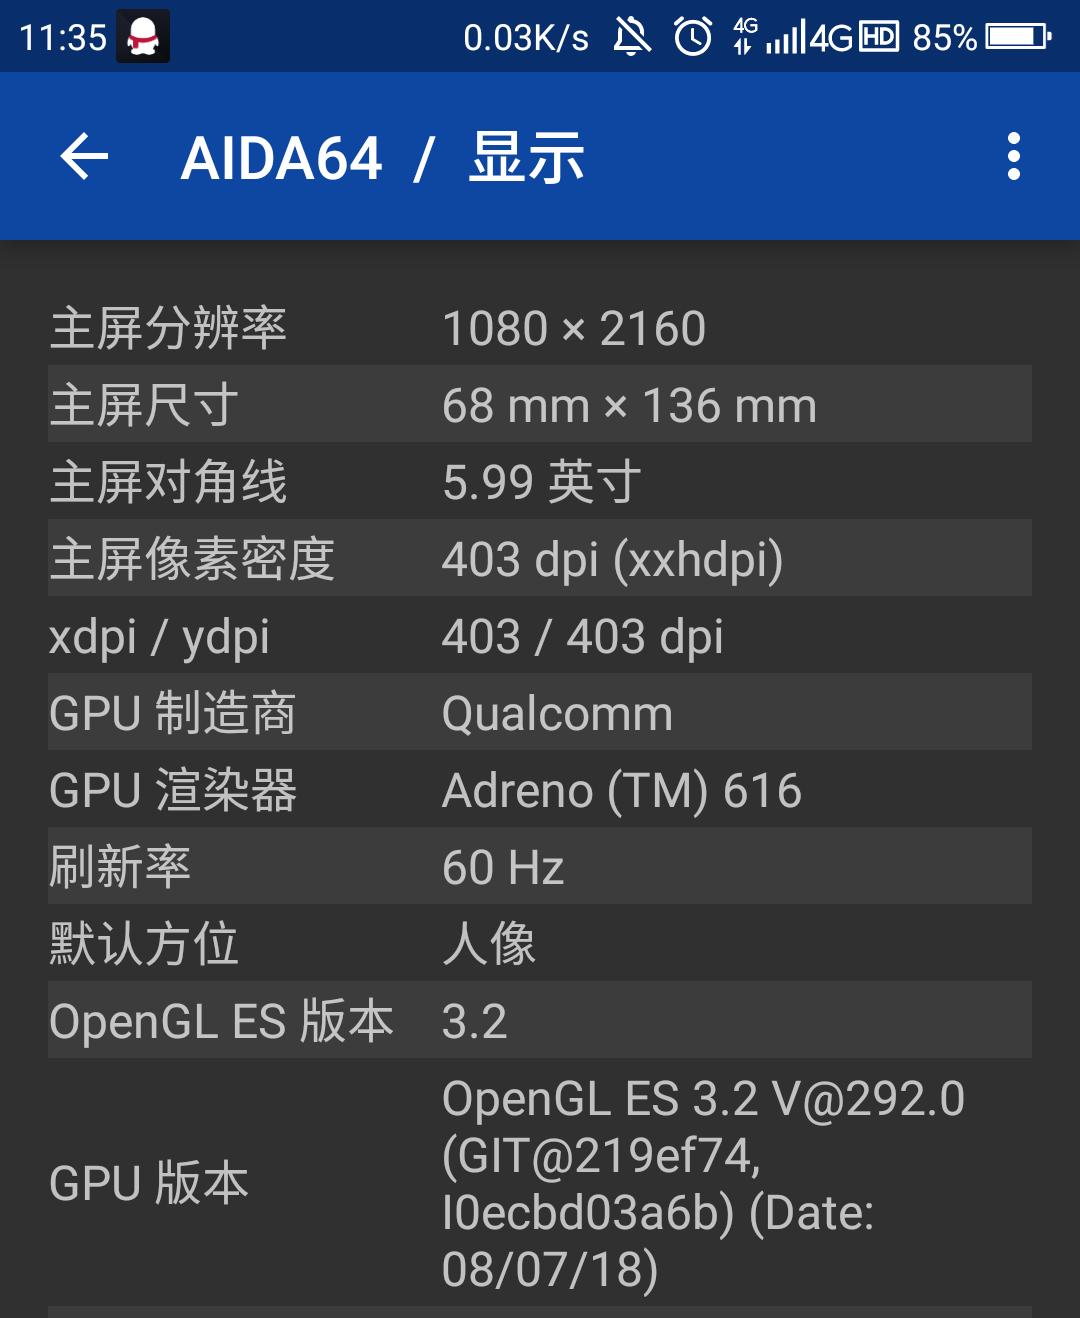 Screenshot_2018-11-23-11-35-09.png